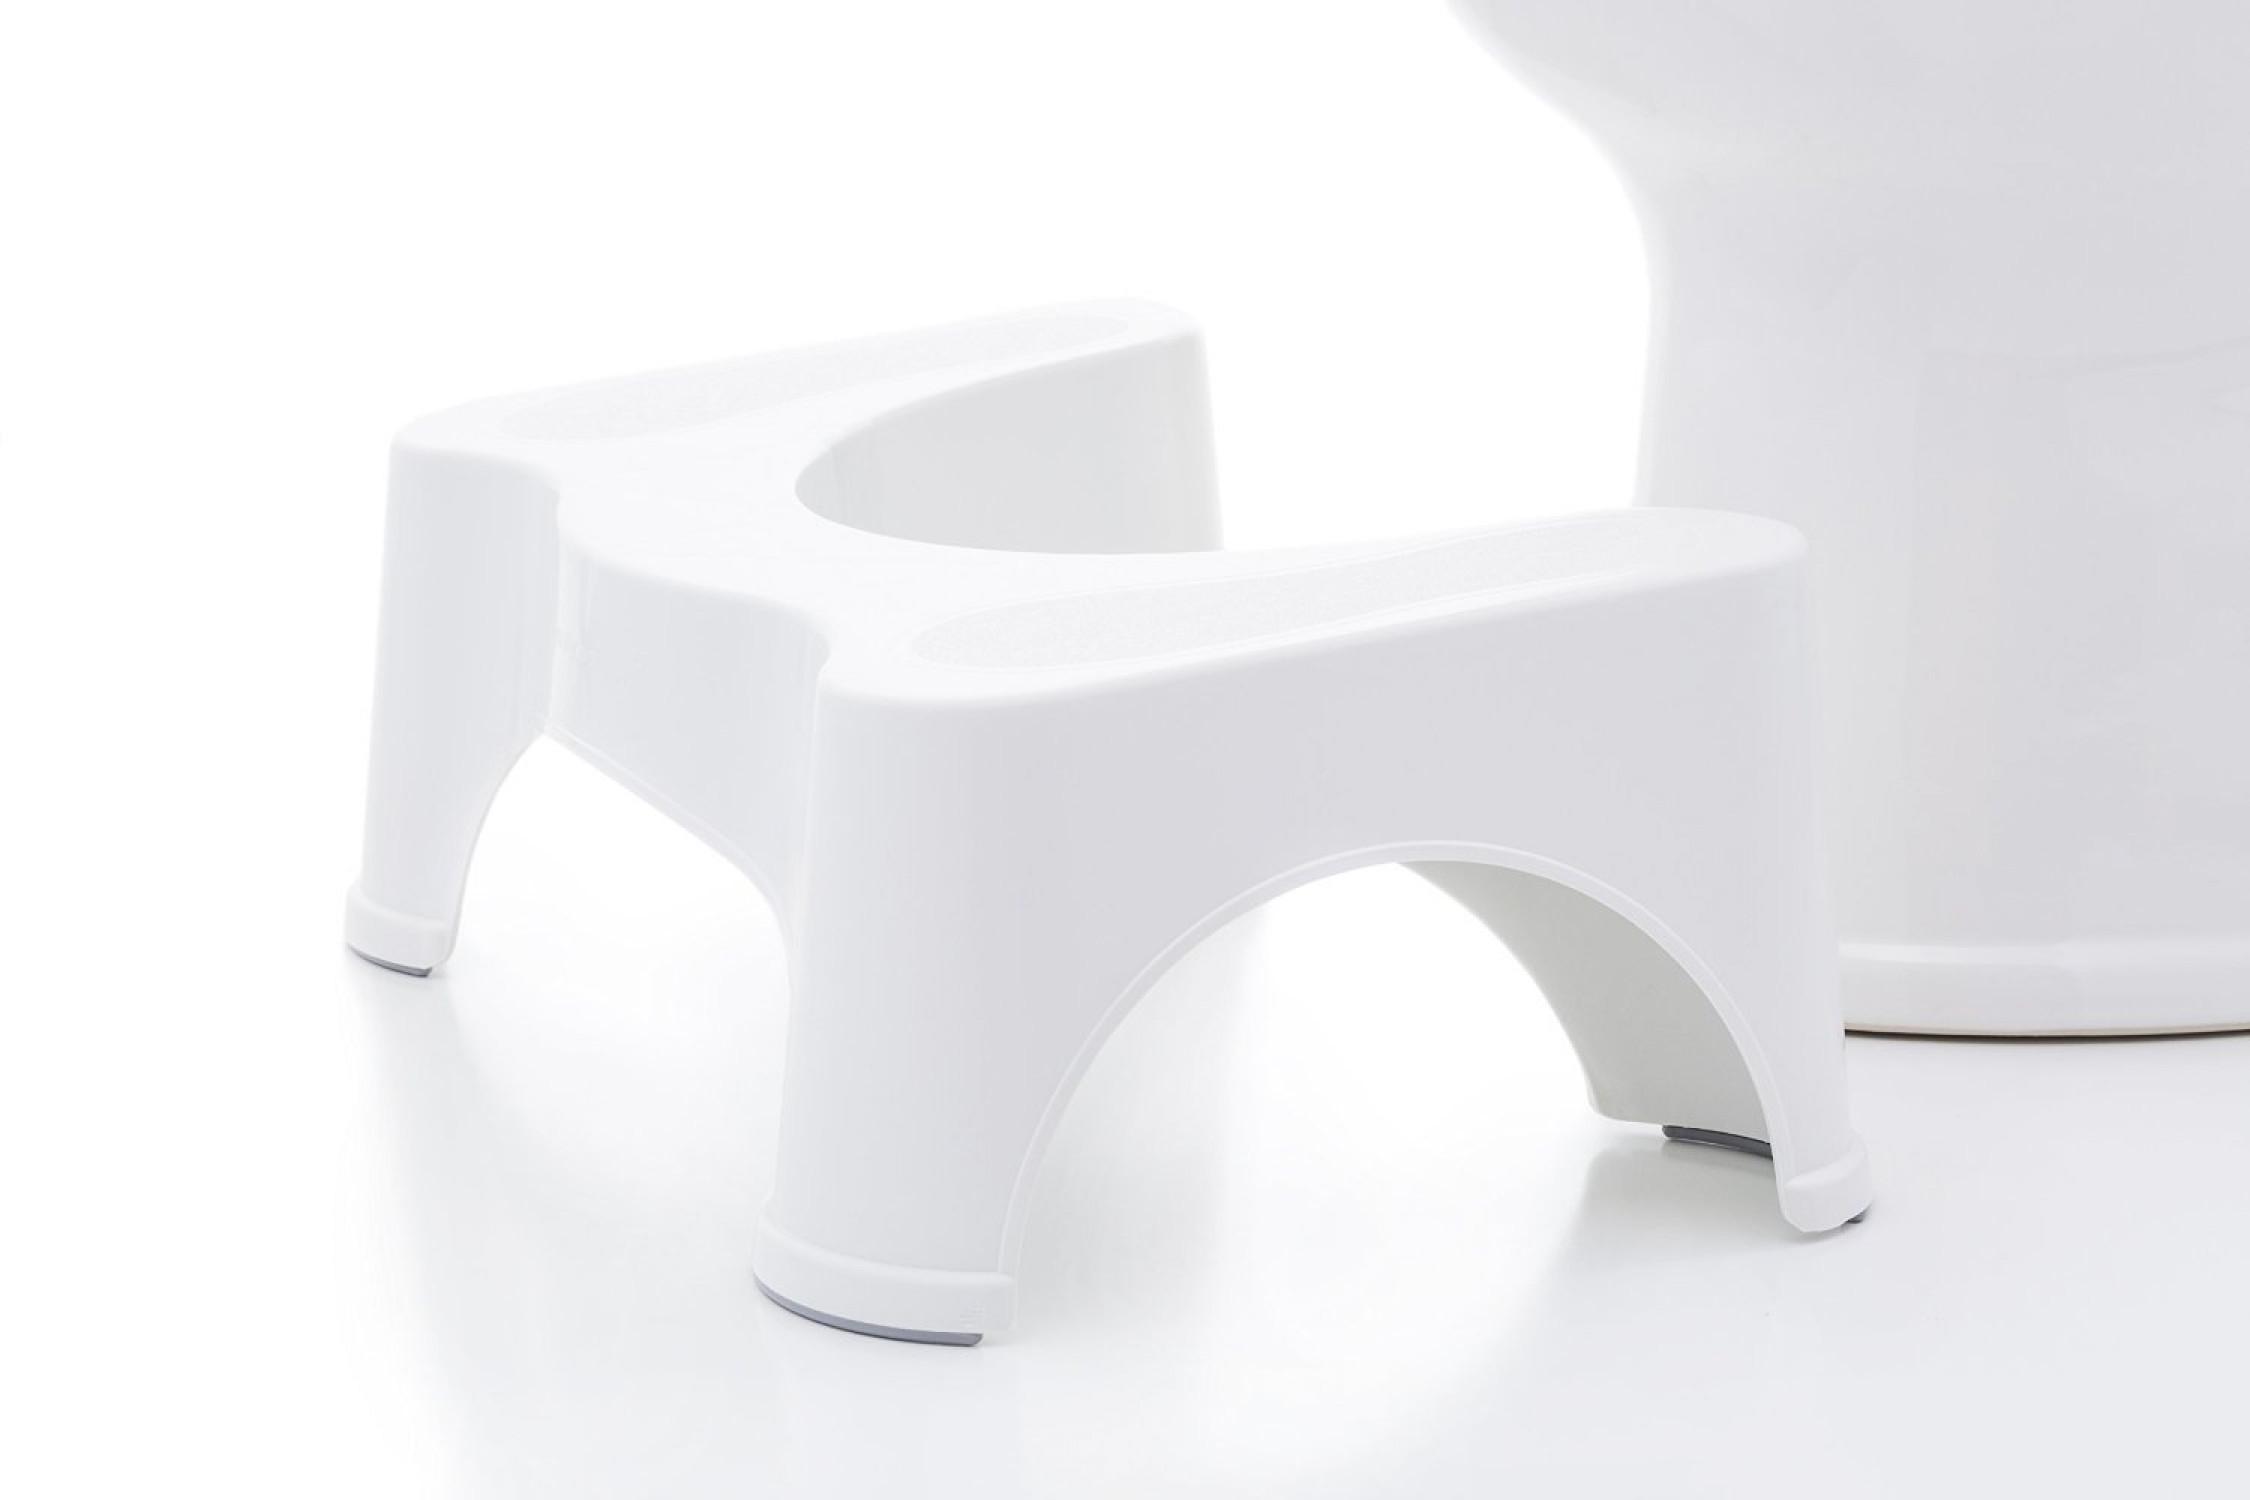 Squatty Potty Ecco Toilet Stool Bathroom Accessory Set